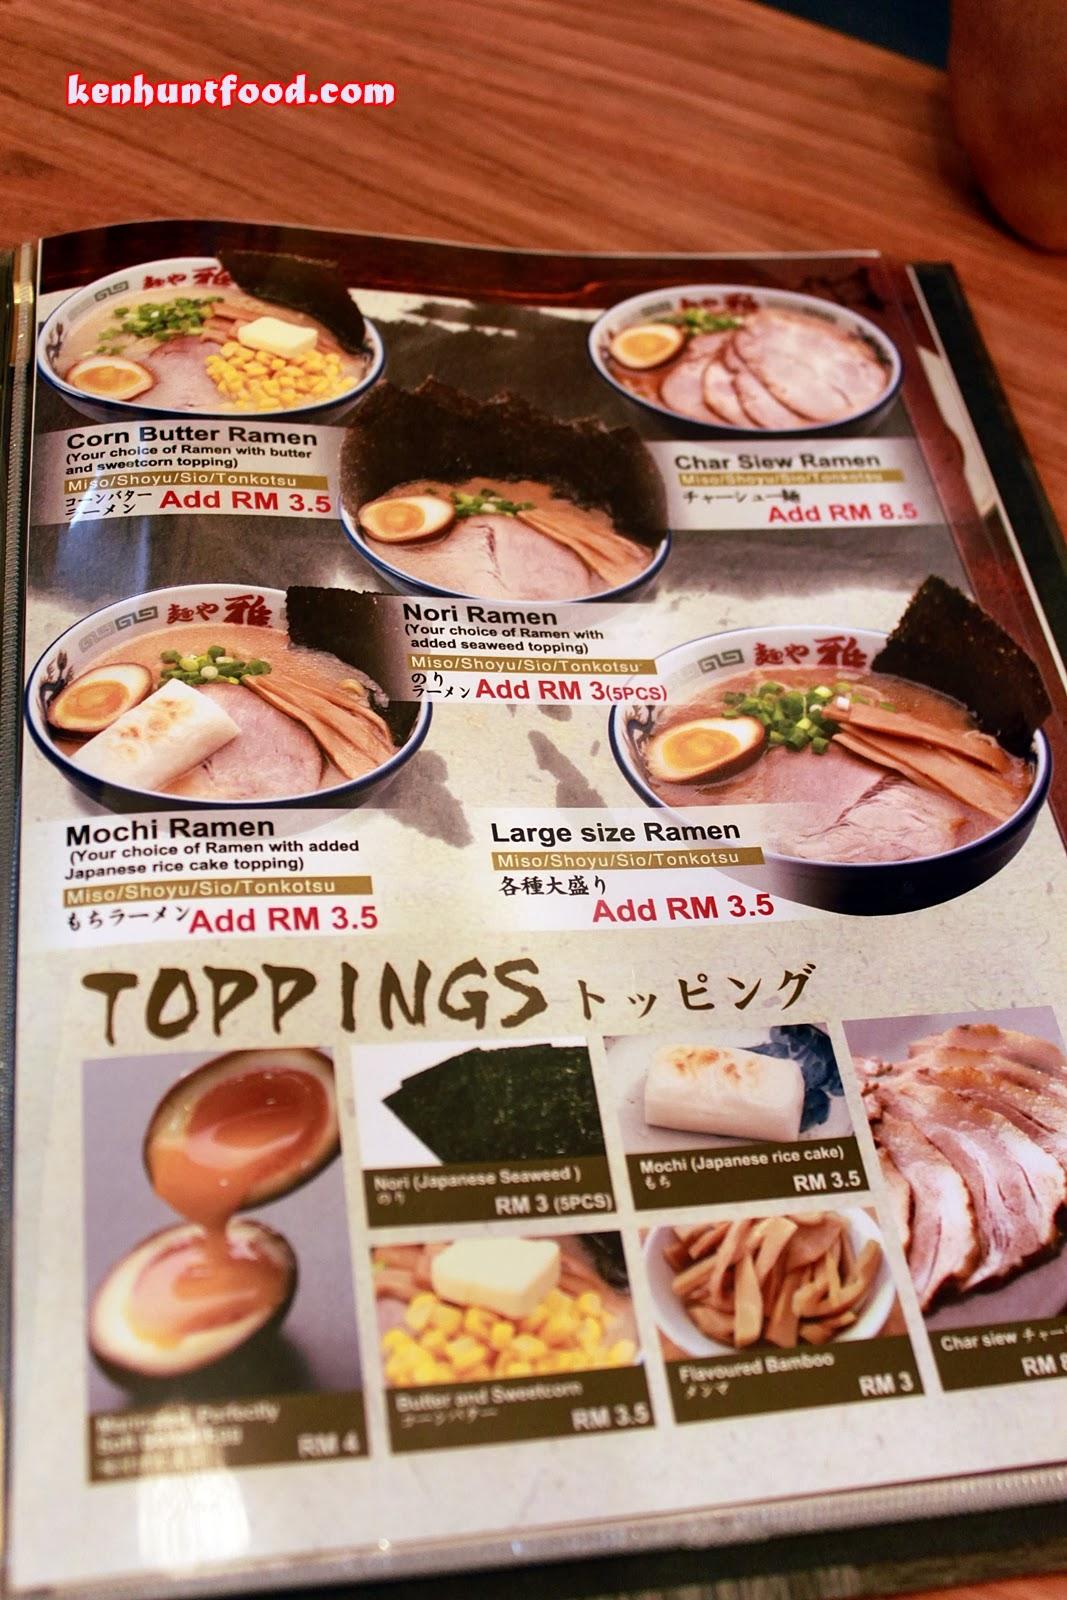 Ken Hunts Food: Menya Miyabi Hokkaido Ramen (麺や 雅